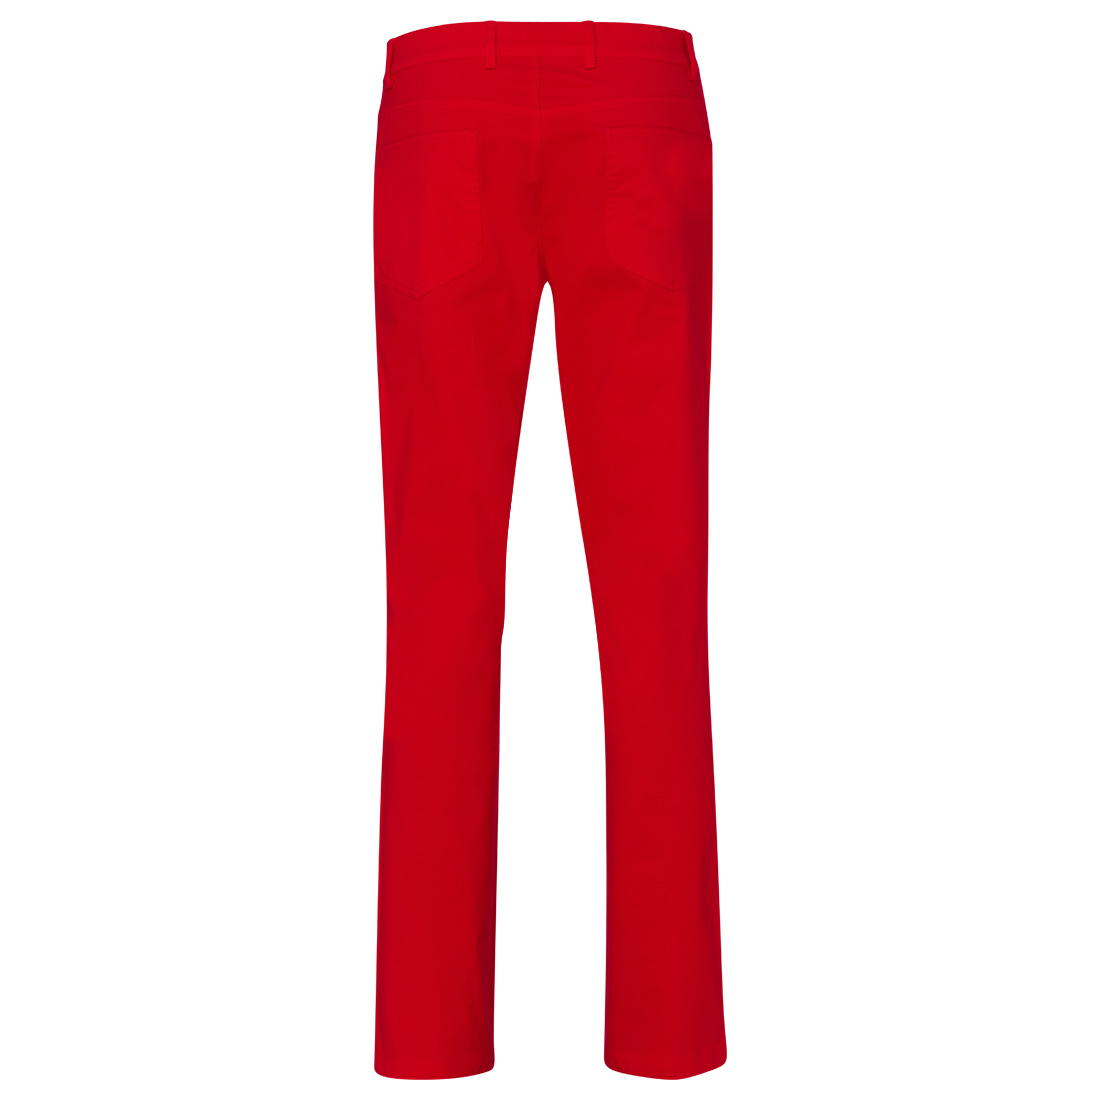 Herren Golfhose im 5-Pocket-Stil